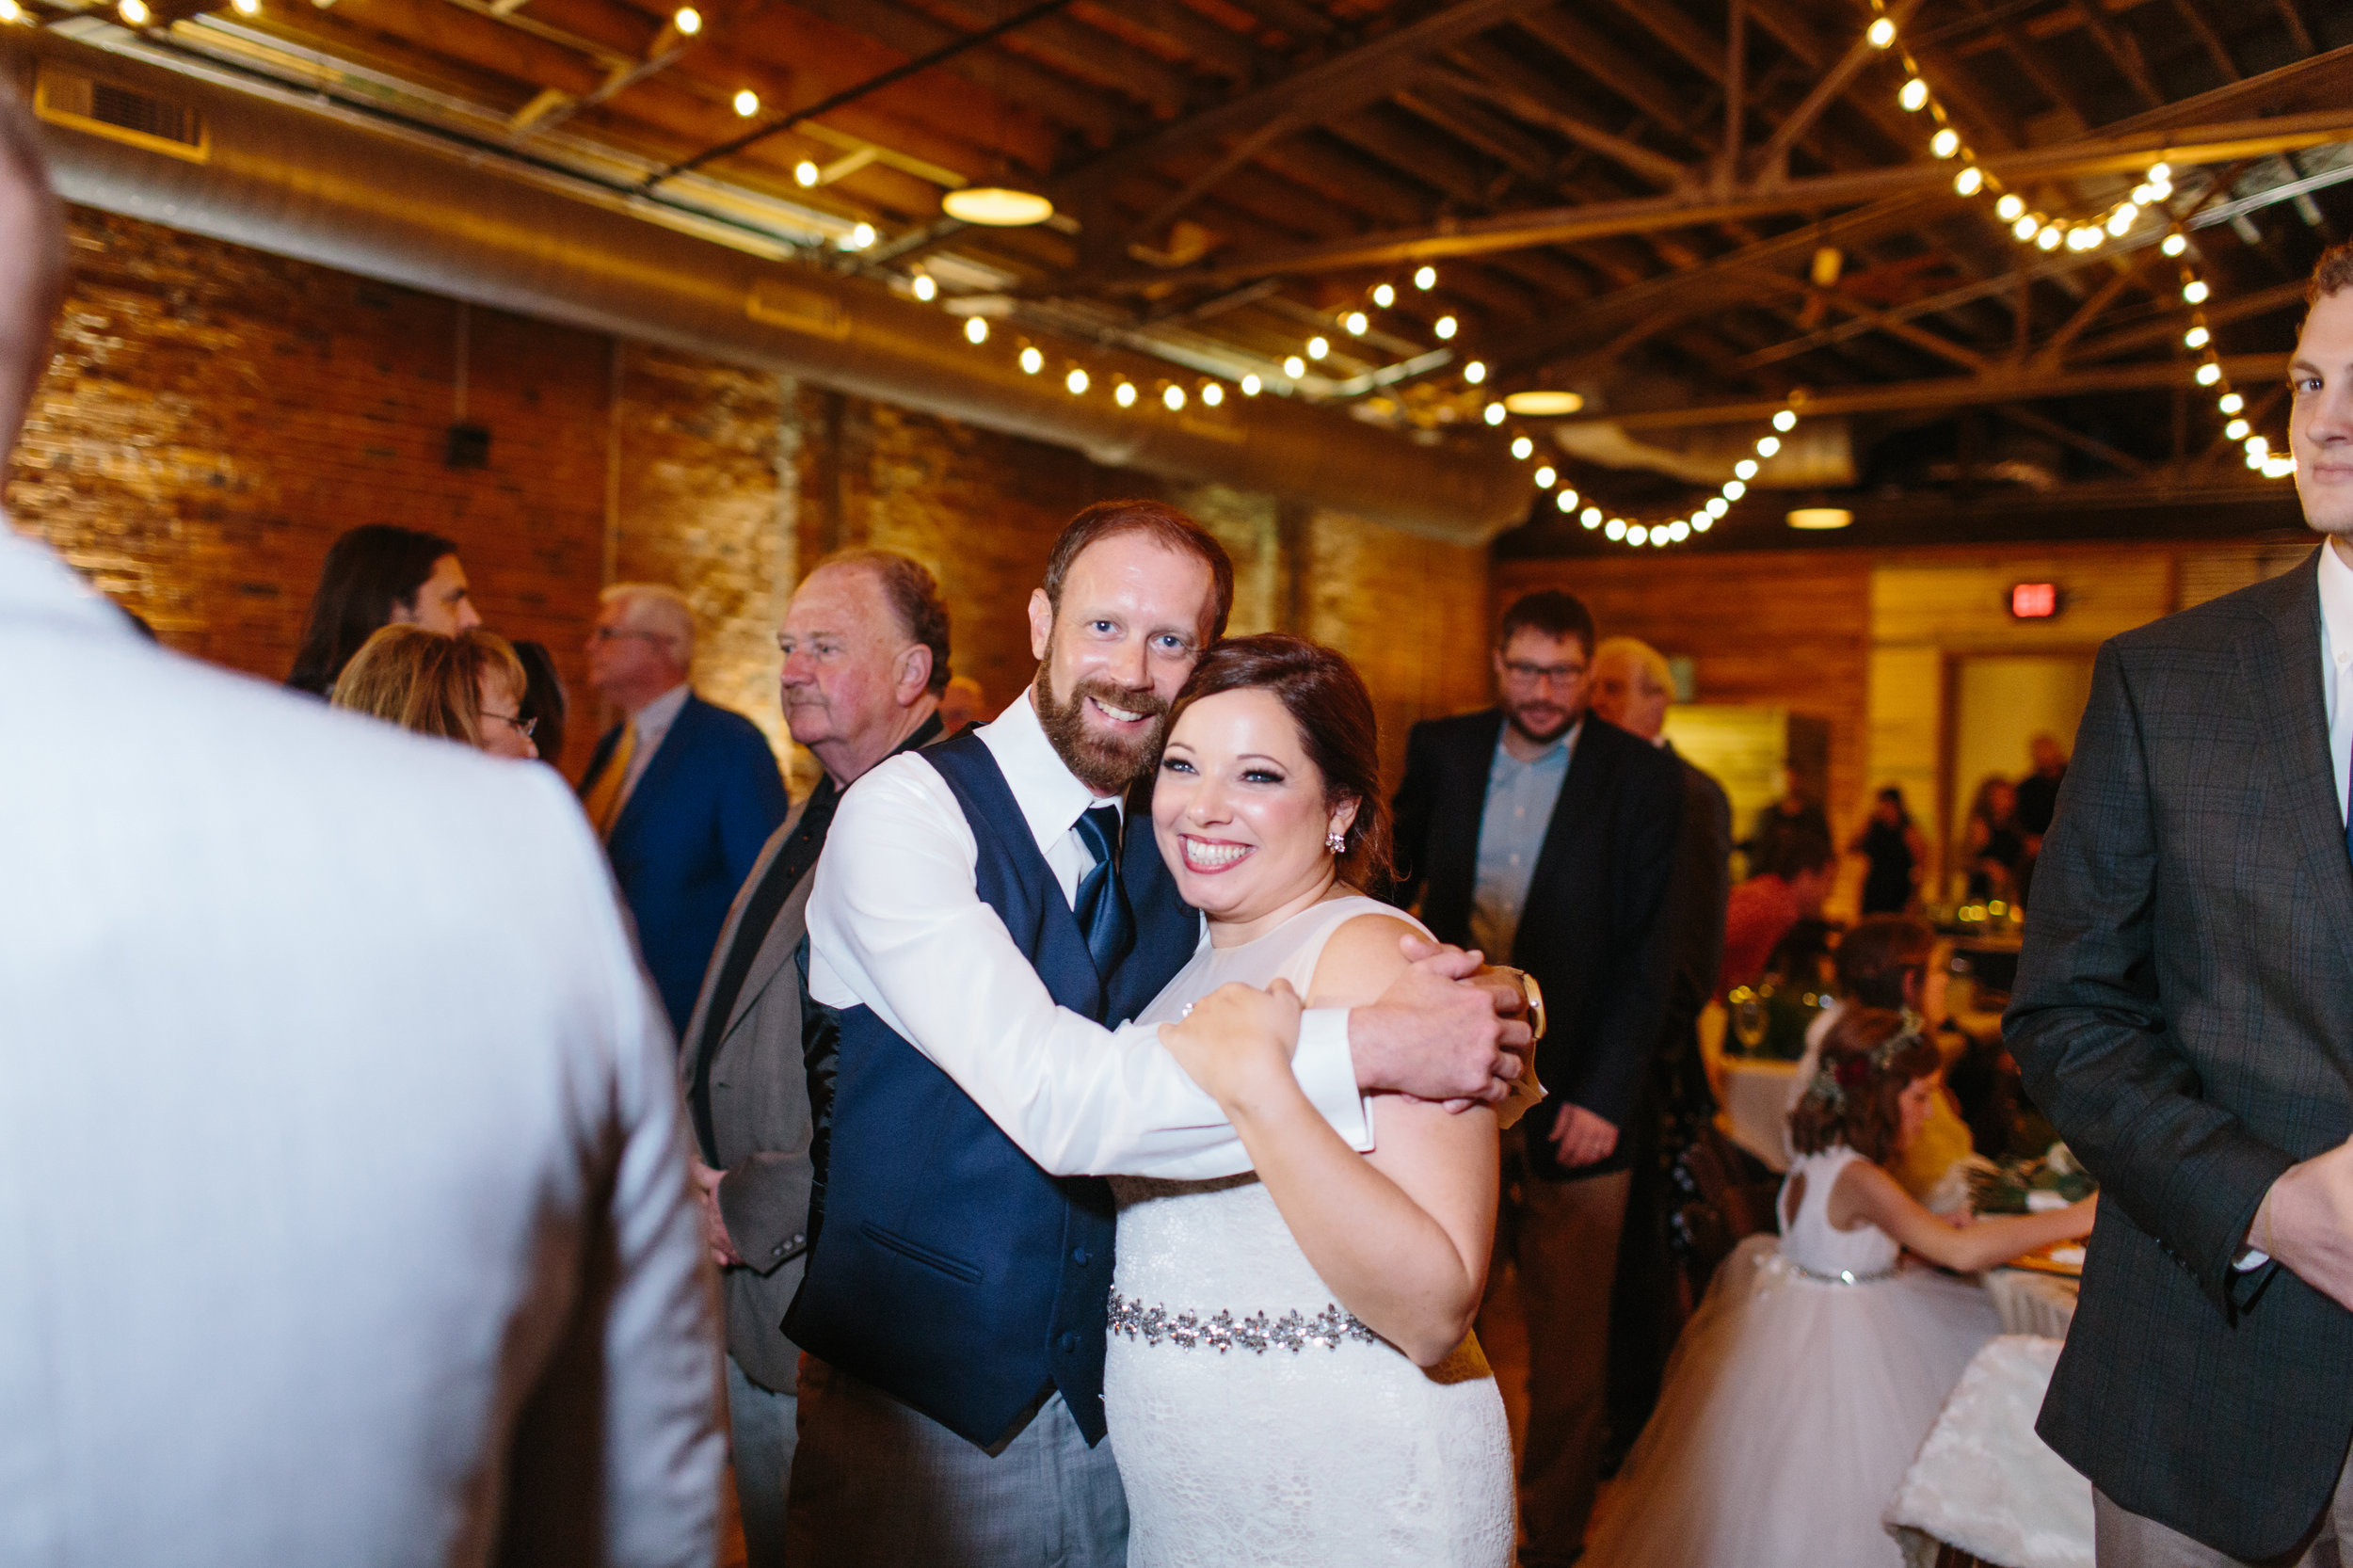 Jessica_Bryan_Wedding_Standard_Knoxville_Abigail_Malone_Photography-666.jpg